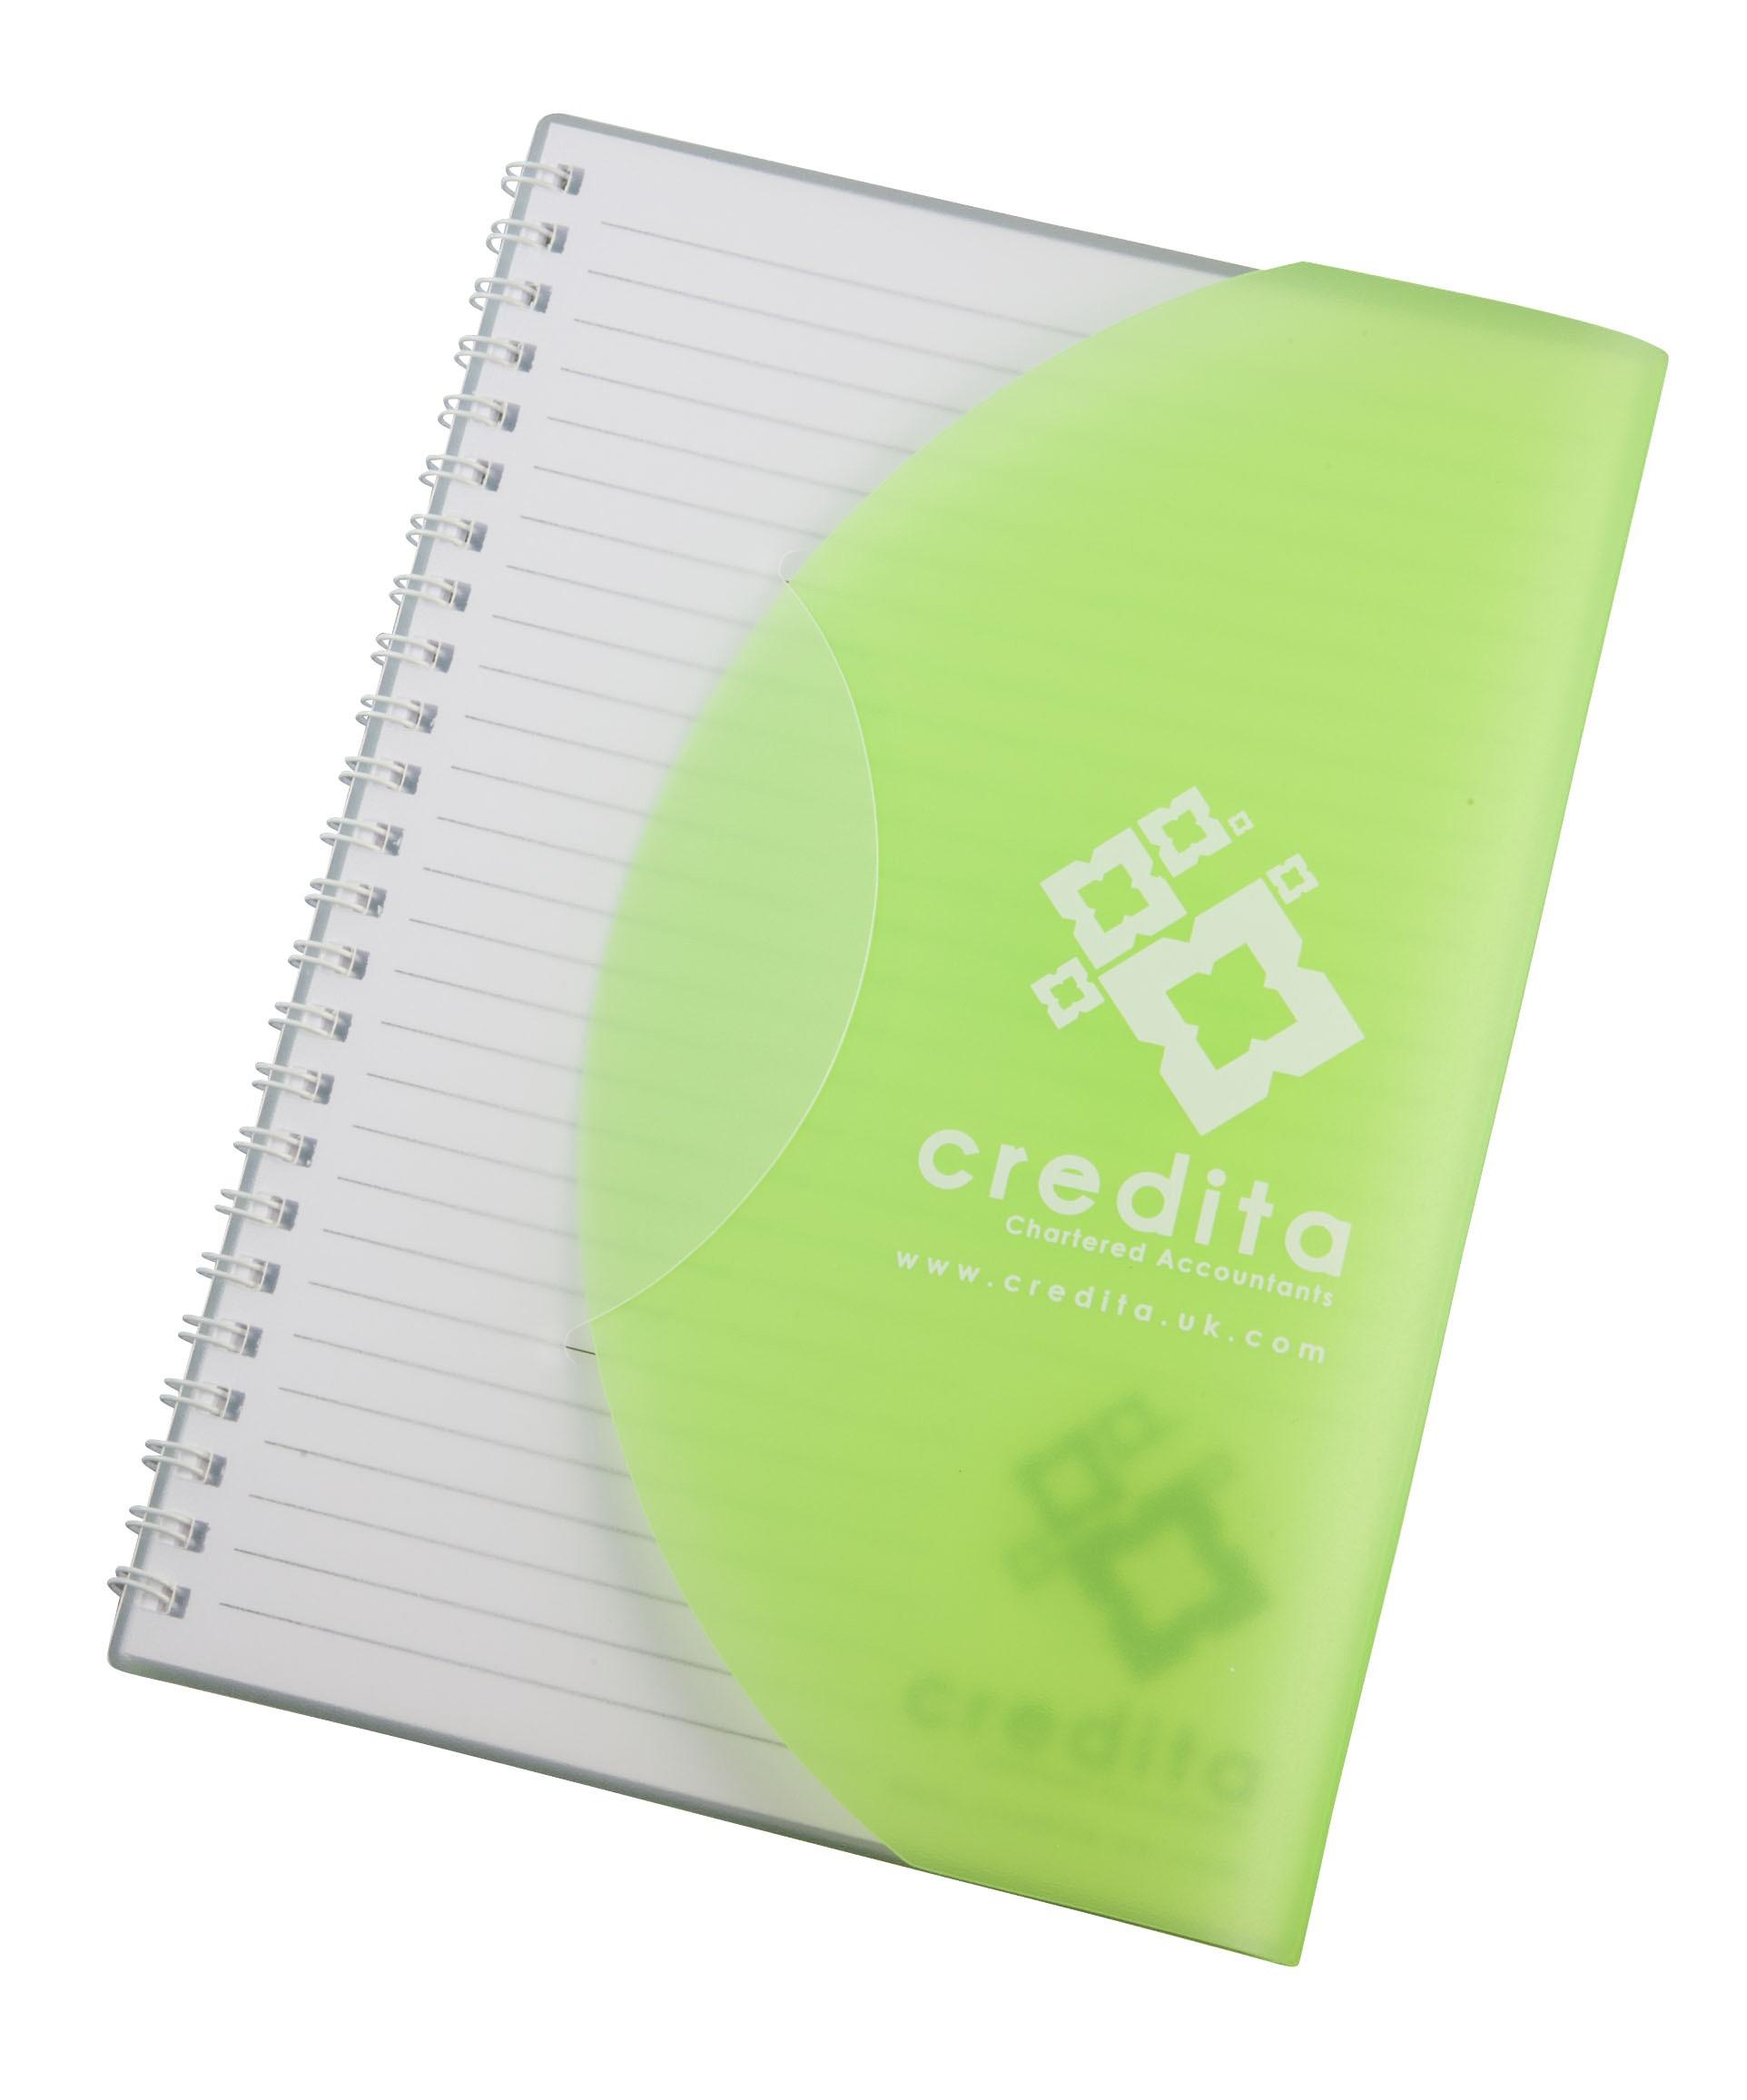 Curve wiro Notebooks Wiro Branded Notebooks